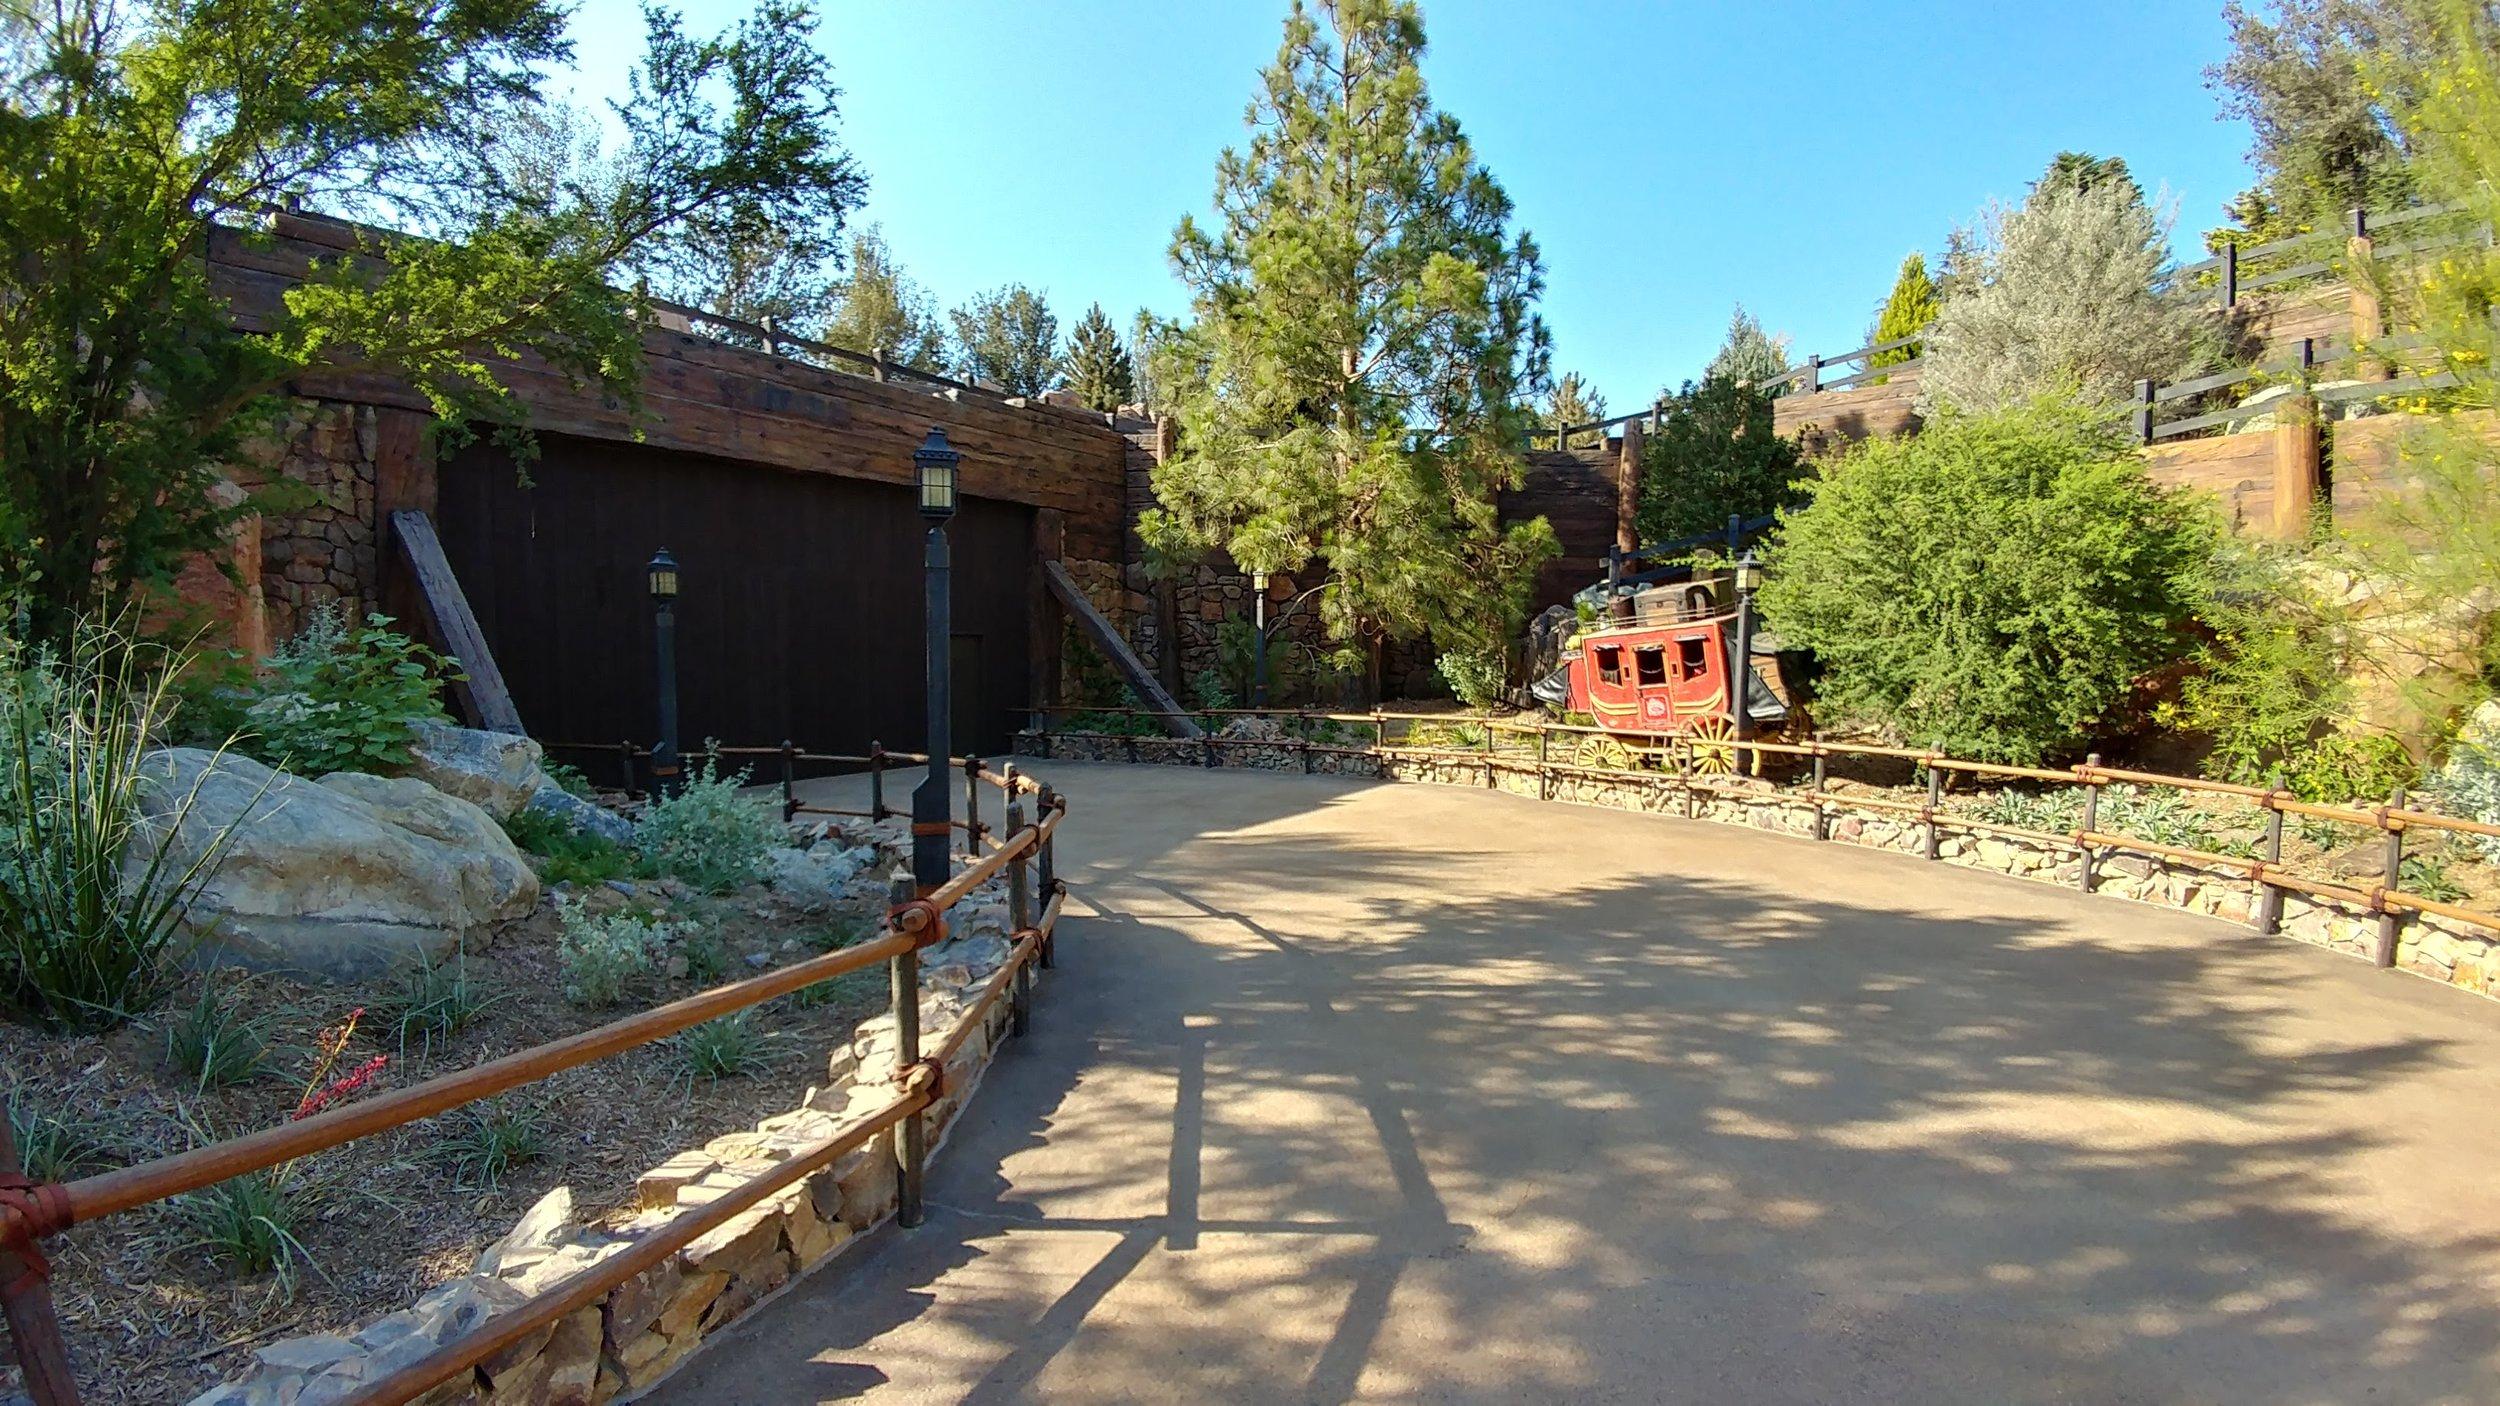 Trail To Star Wars: Galaxy's Edge - Disneyland